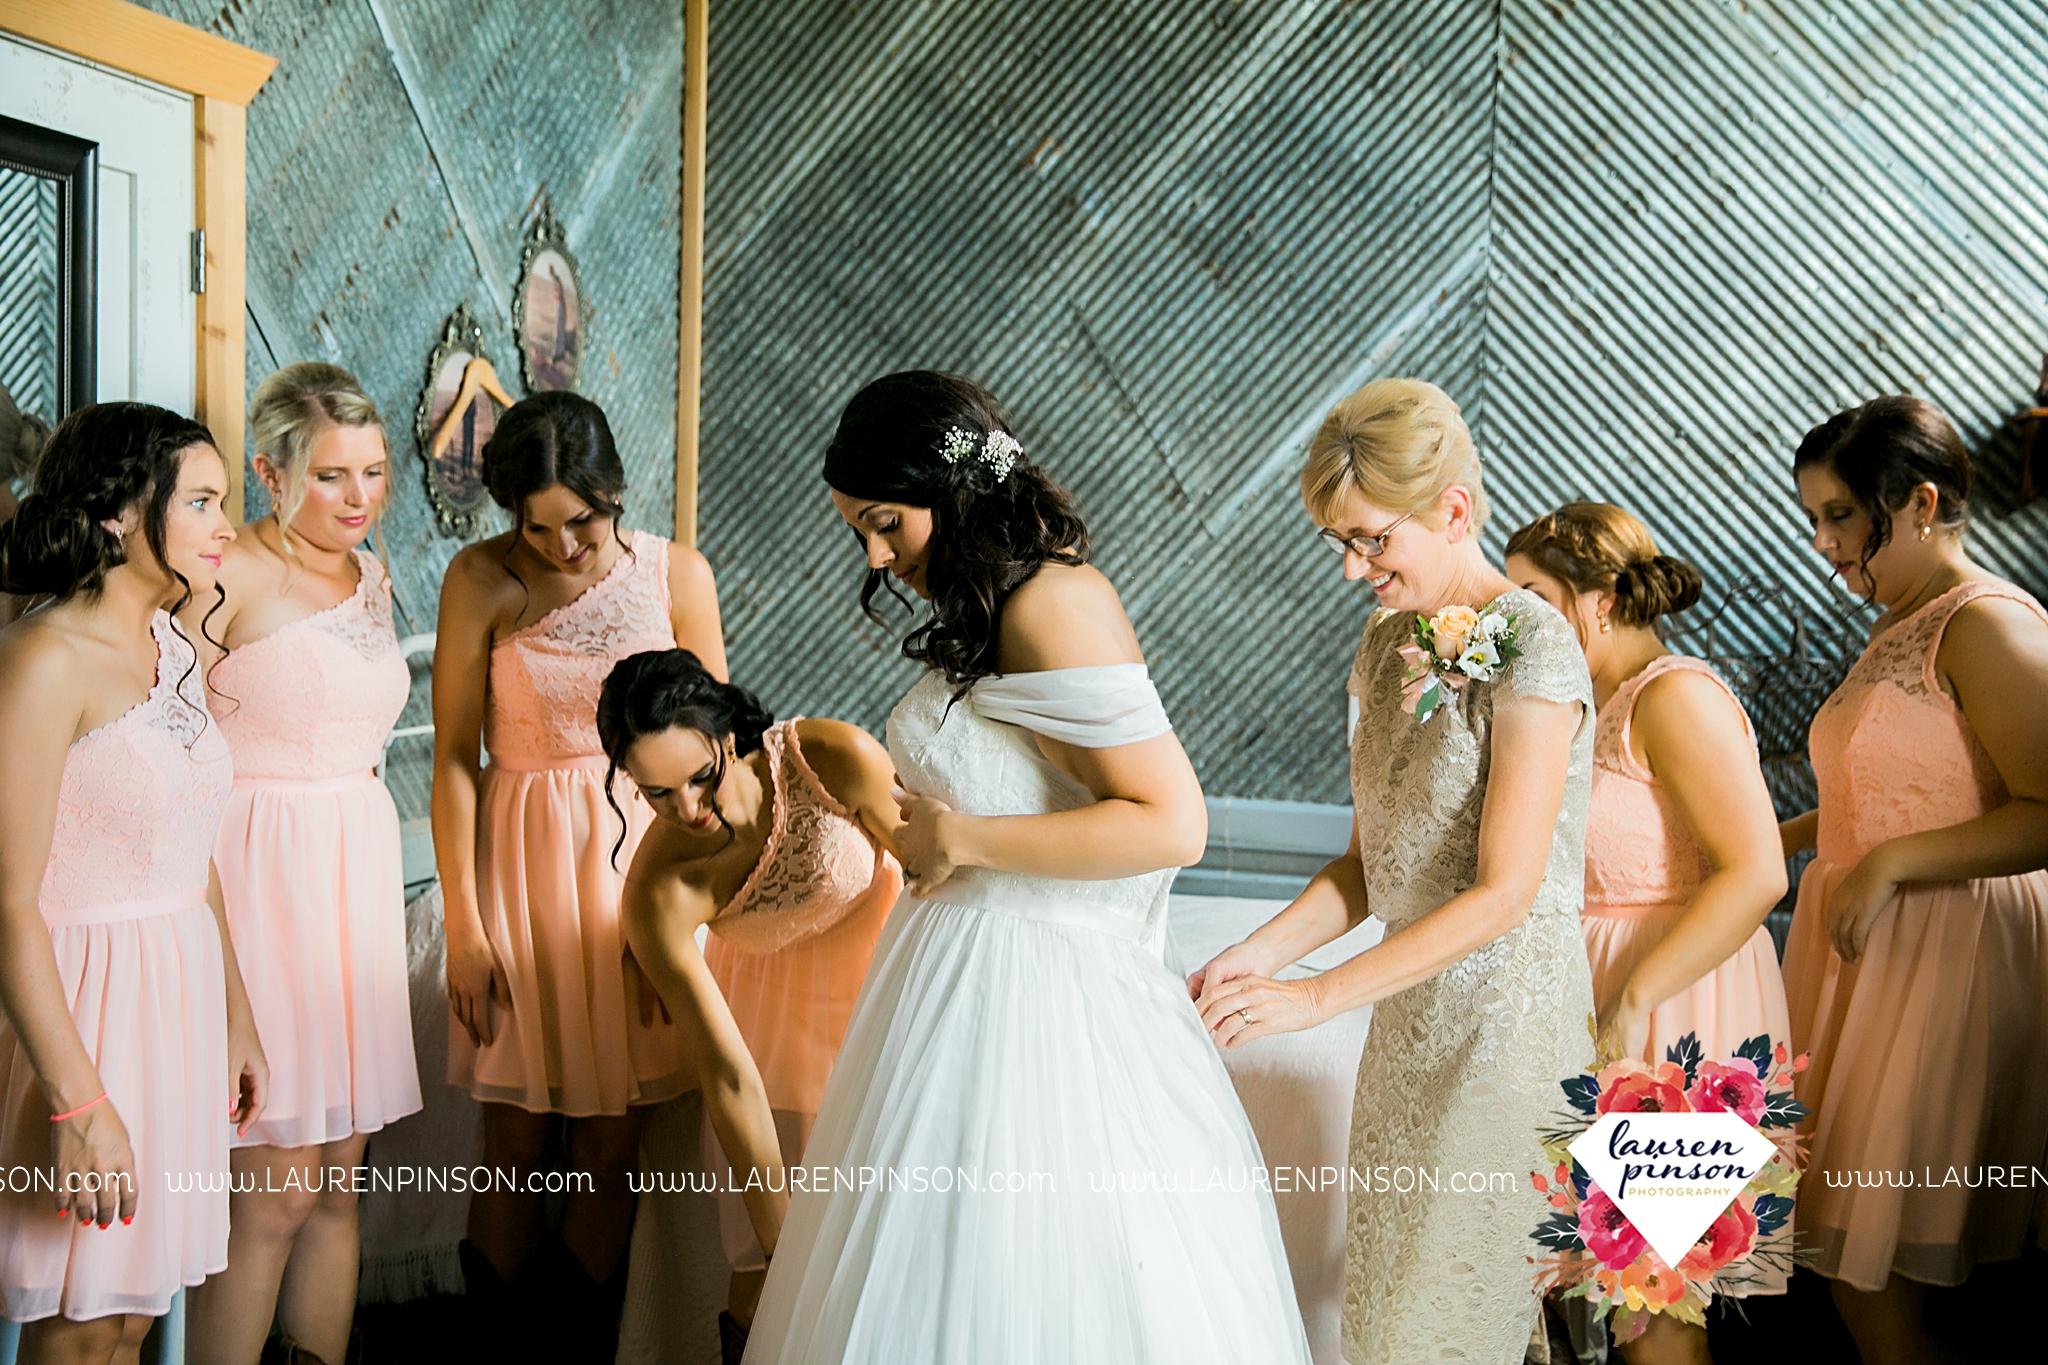 jones-barn-willow-creek-ranch-wedding-in-cleburne-texas-fort-worth-dfw-wichita-falls-wedding-photography_3193.jpg